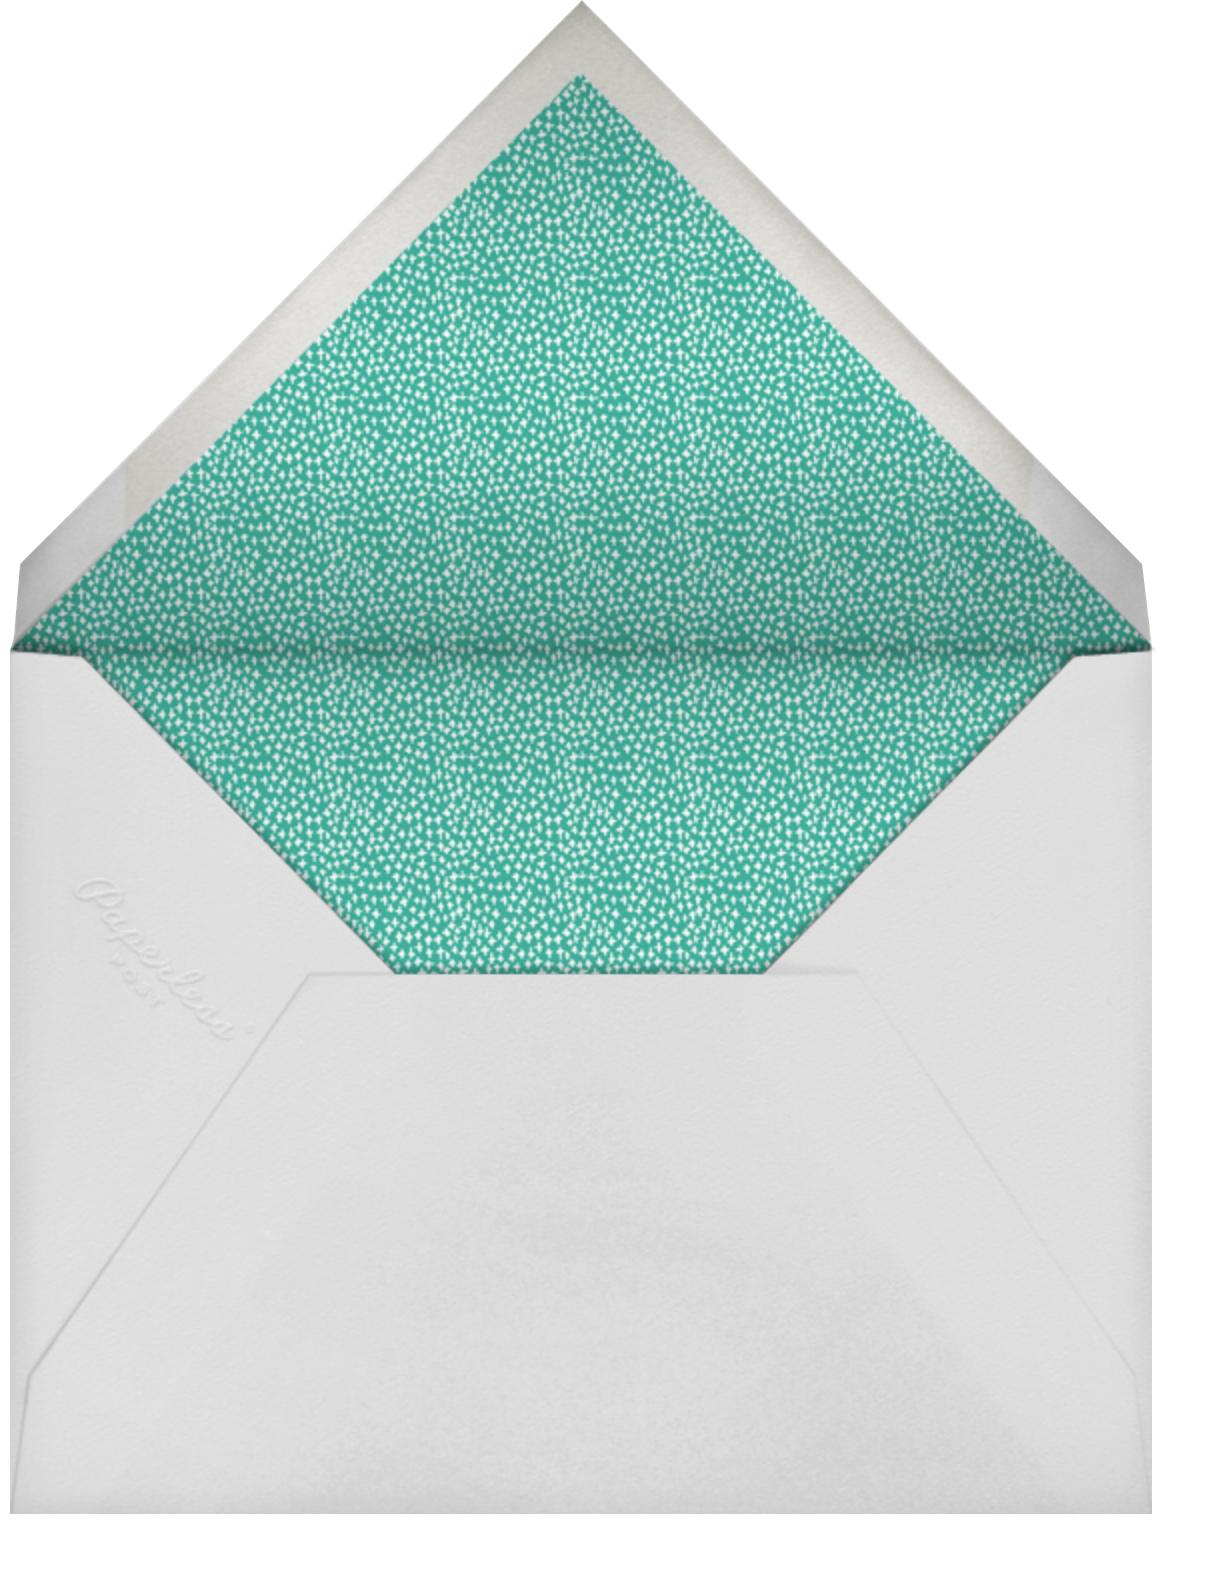 Pine and Dandy - White - Mr. Boddington's Studio - Baby shower - envelope back